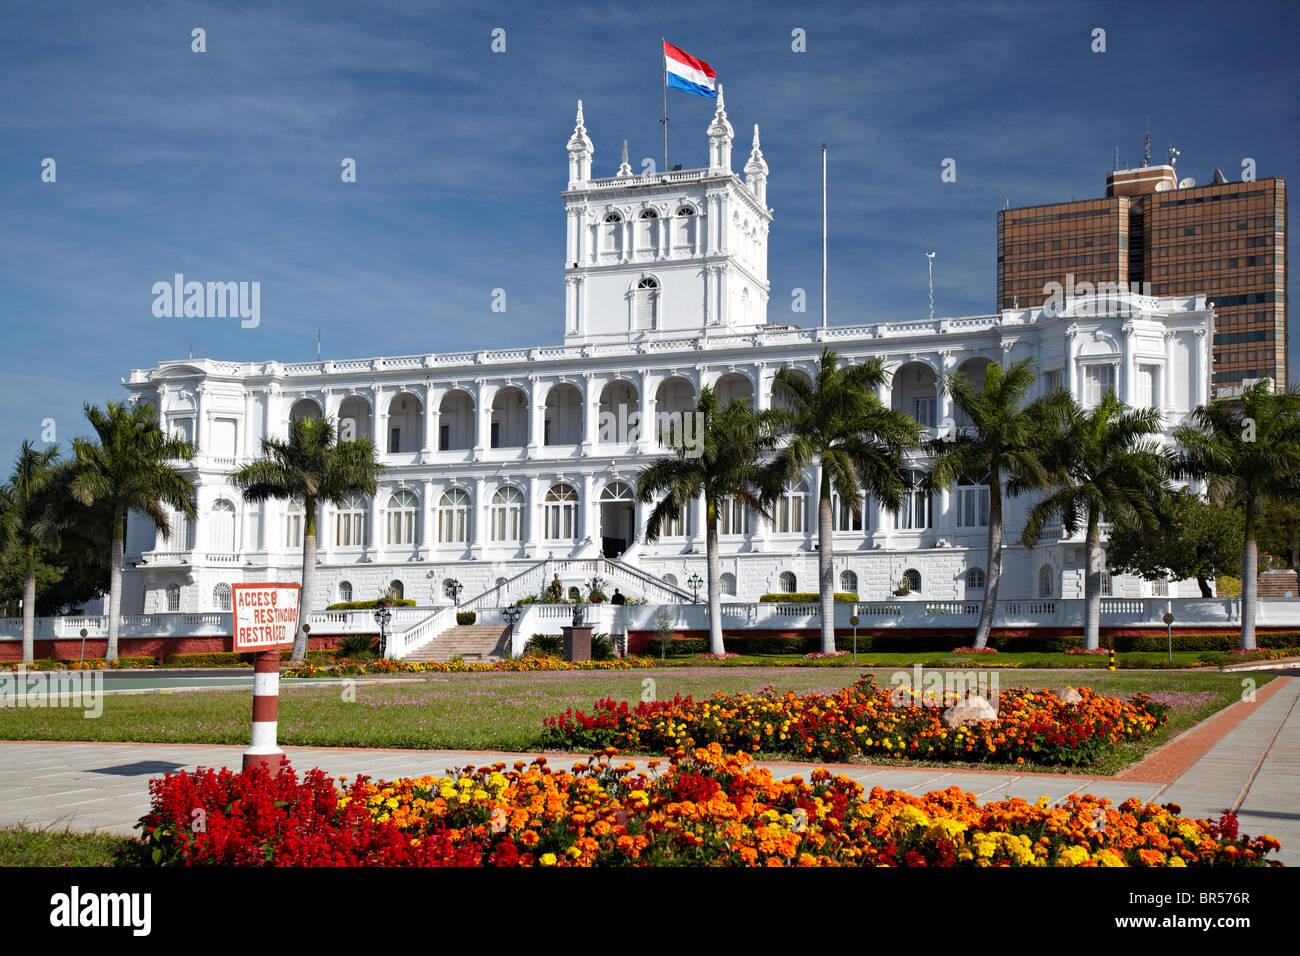 Palacio de Gobierno (Government Palace), Asuncion, Paraguay - Stock Image